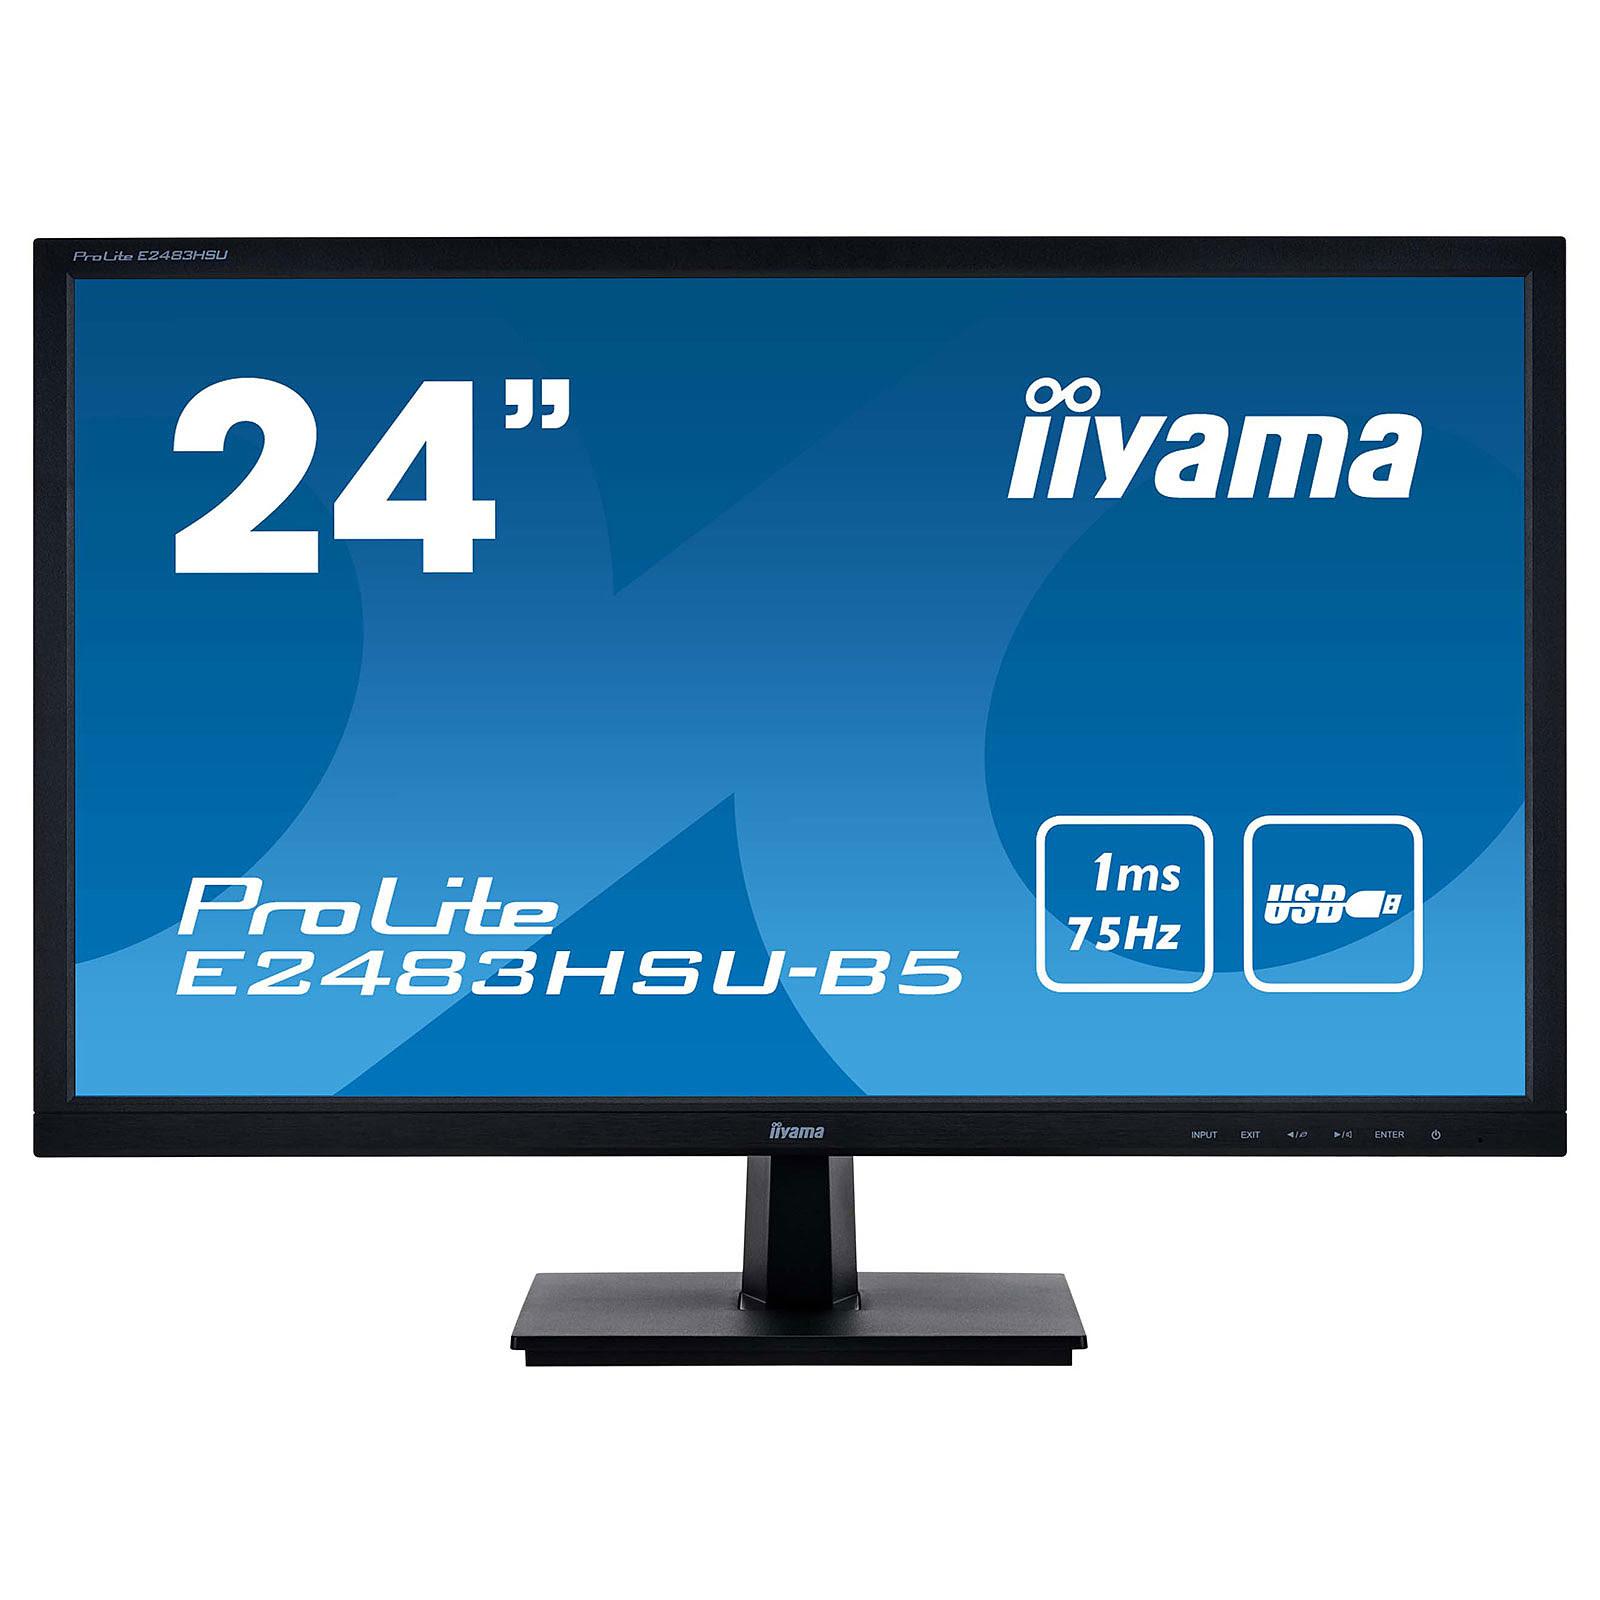 PROLITE E2483HSU-B5 (E2483HSU-B5) - Achat / Vente Ecran PC sur Picata.fr - 0